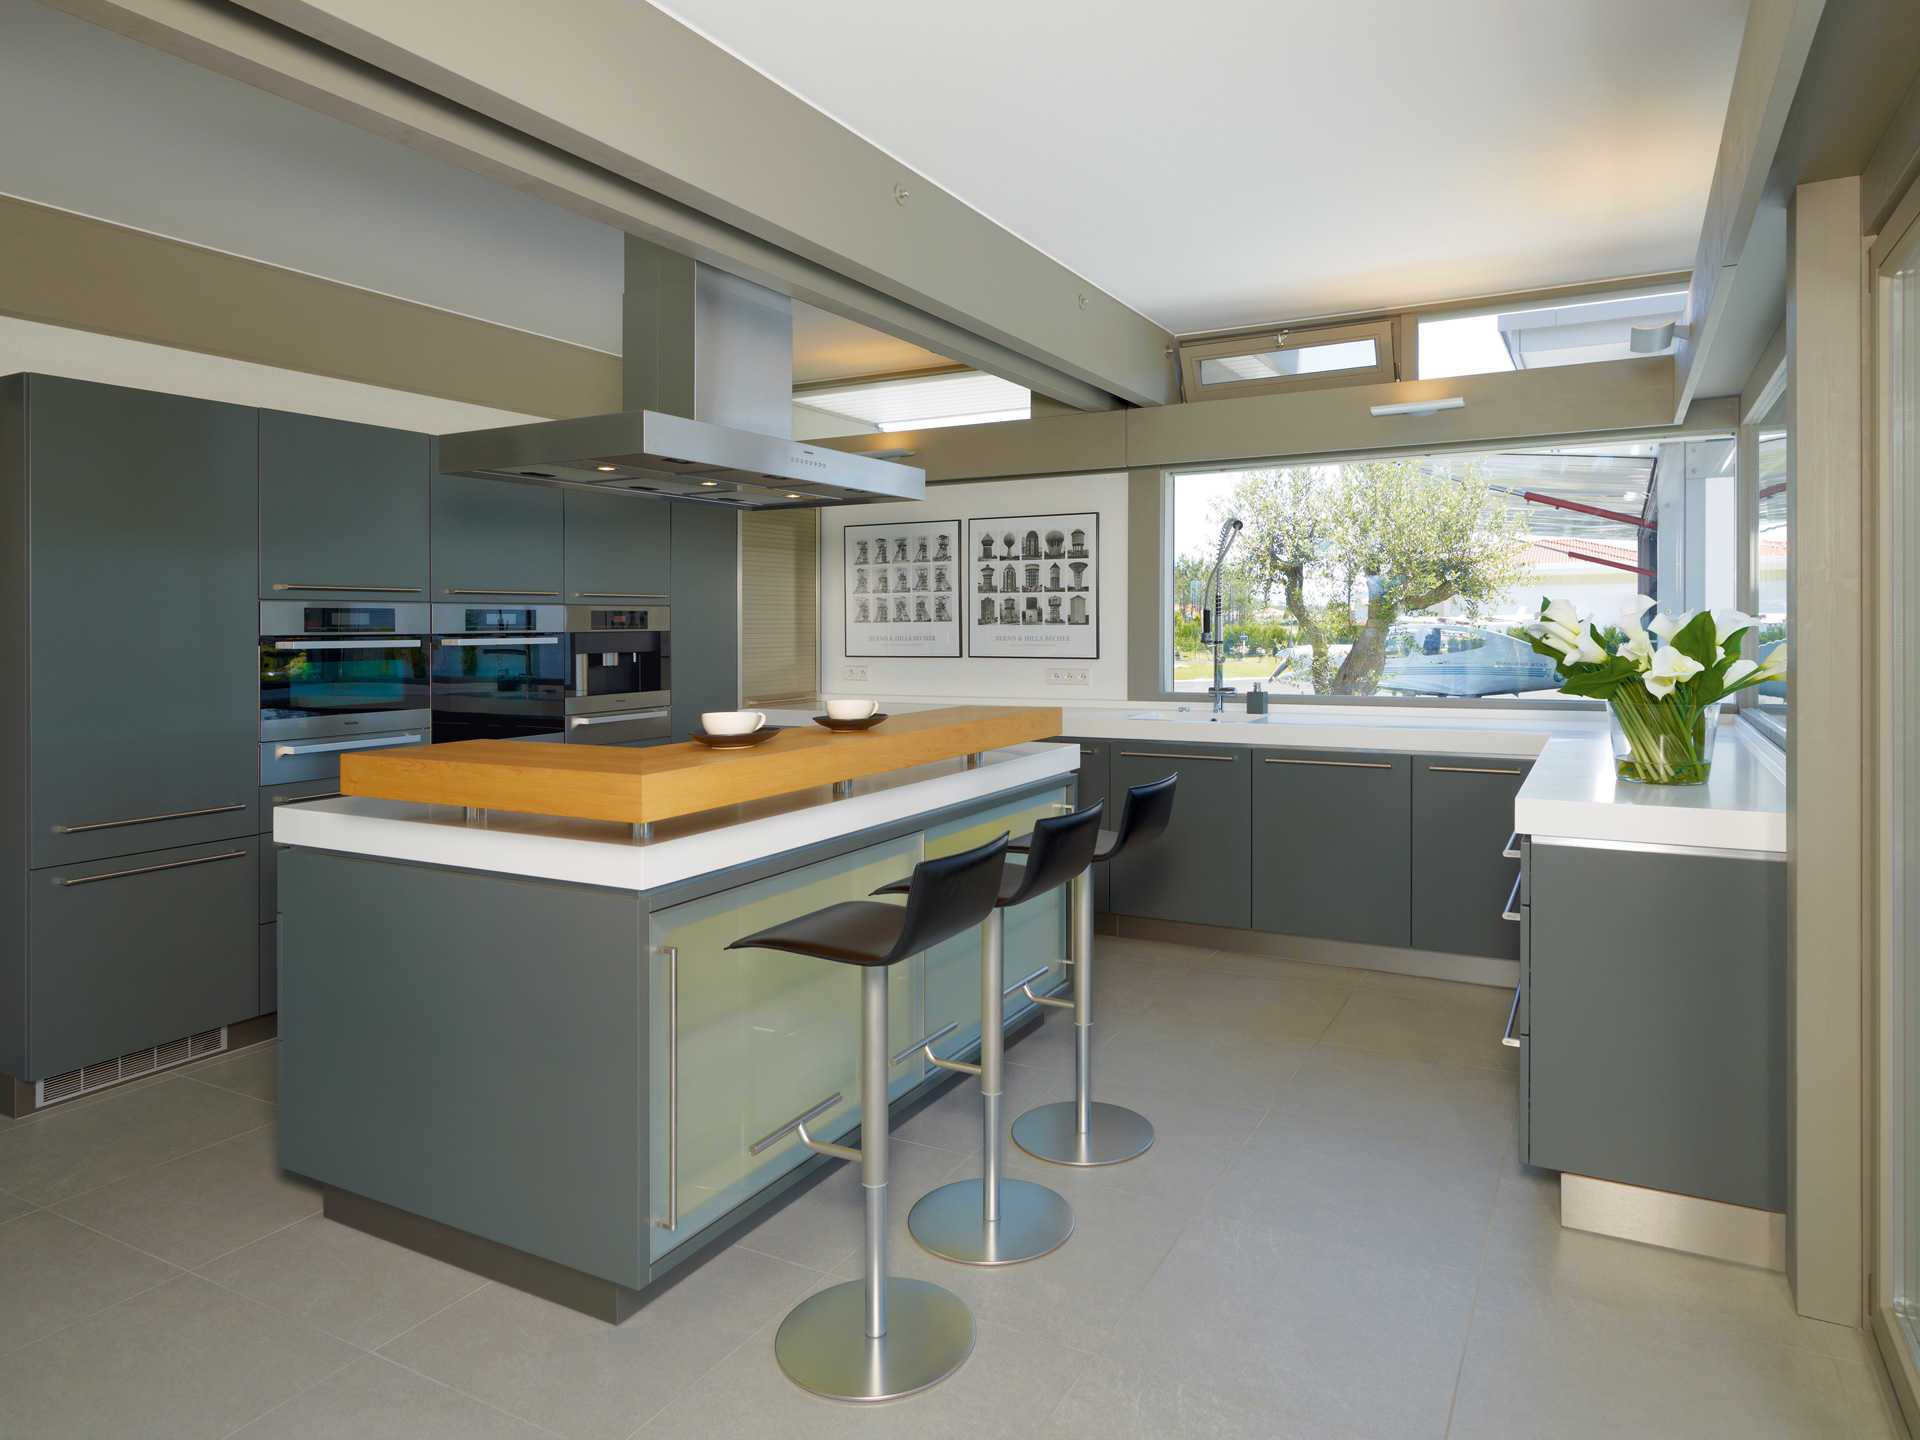 huf haus art 5 mit hangar huf haus. Black Bedroom Furniture Sets. Home Design Ideas